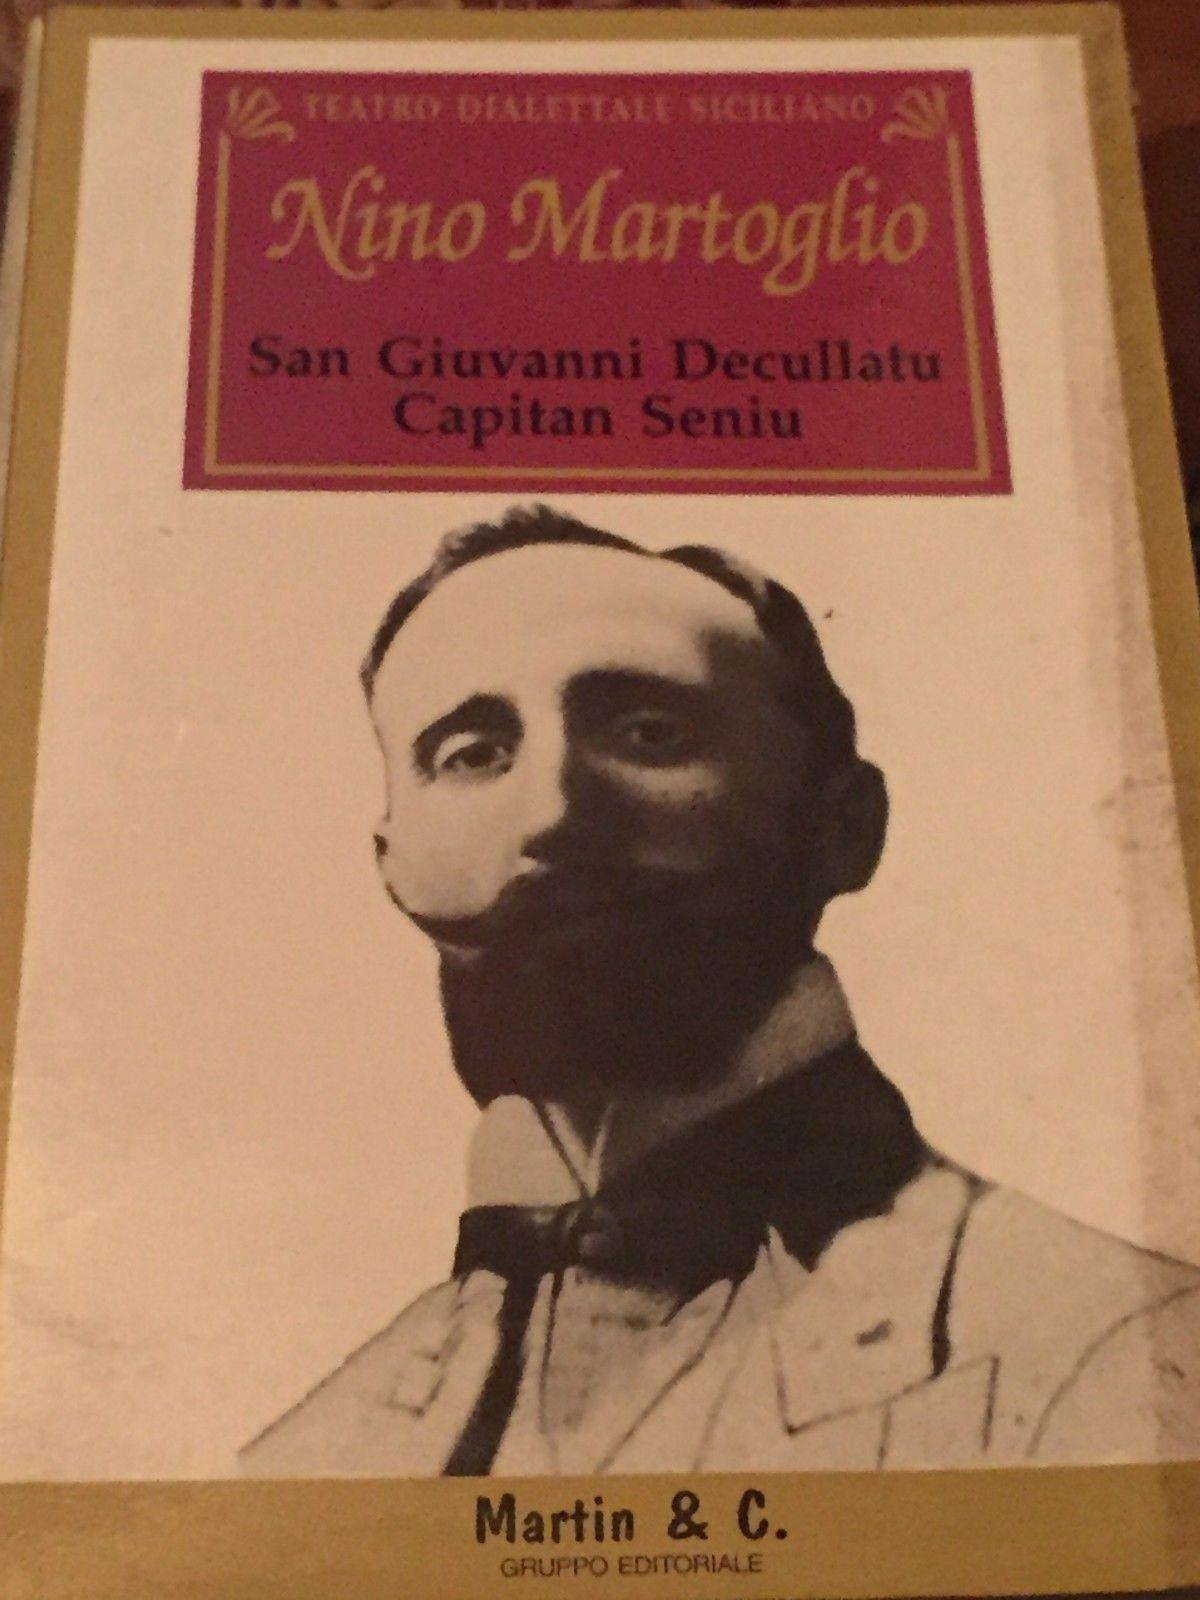 San Giuvanni Decullatu - Capitan Seniu